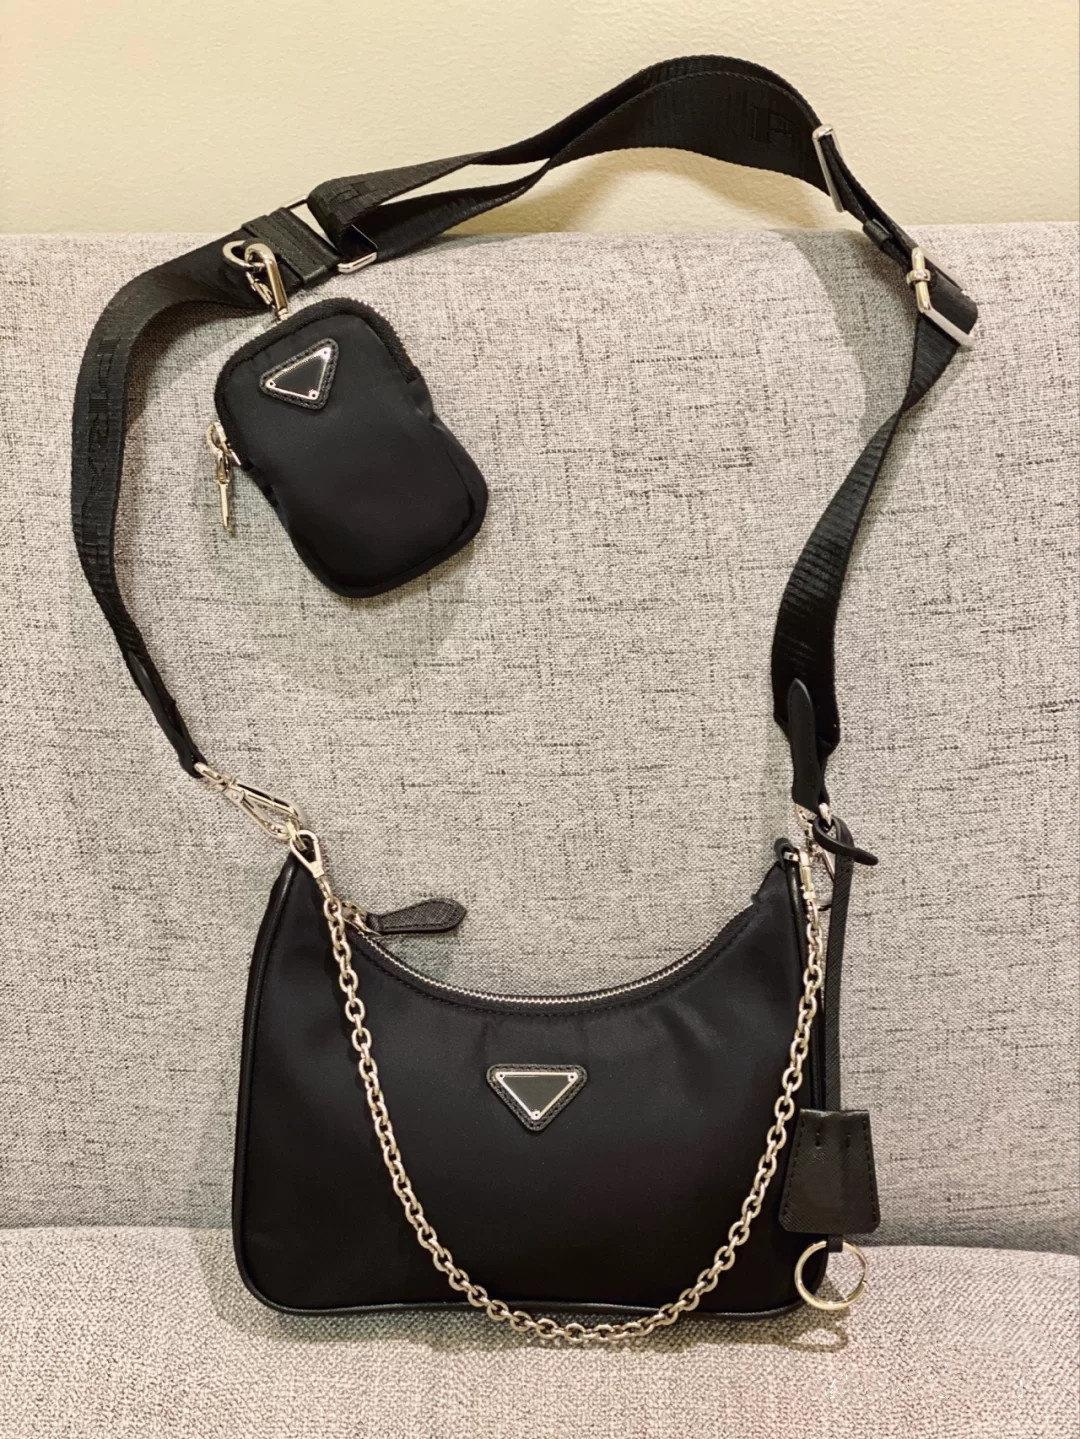 Top quality vintage Tote reedition bag Cross Body Bags logo Designer handbags Messenger Shoulder Luxury Cross-Body Zipper lady chest chain